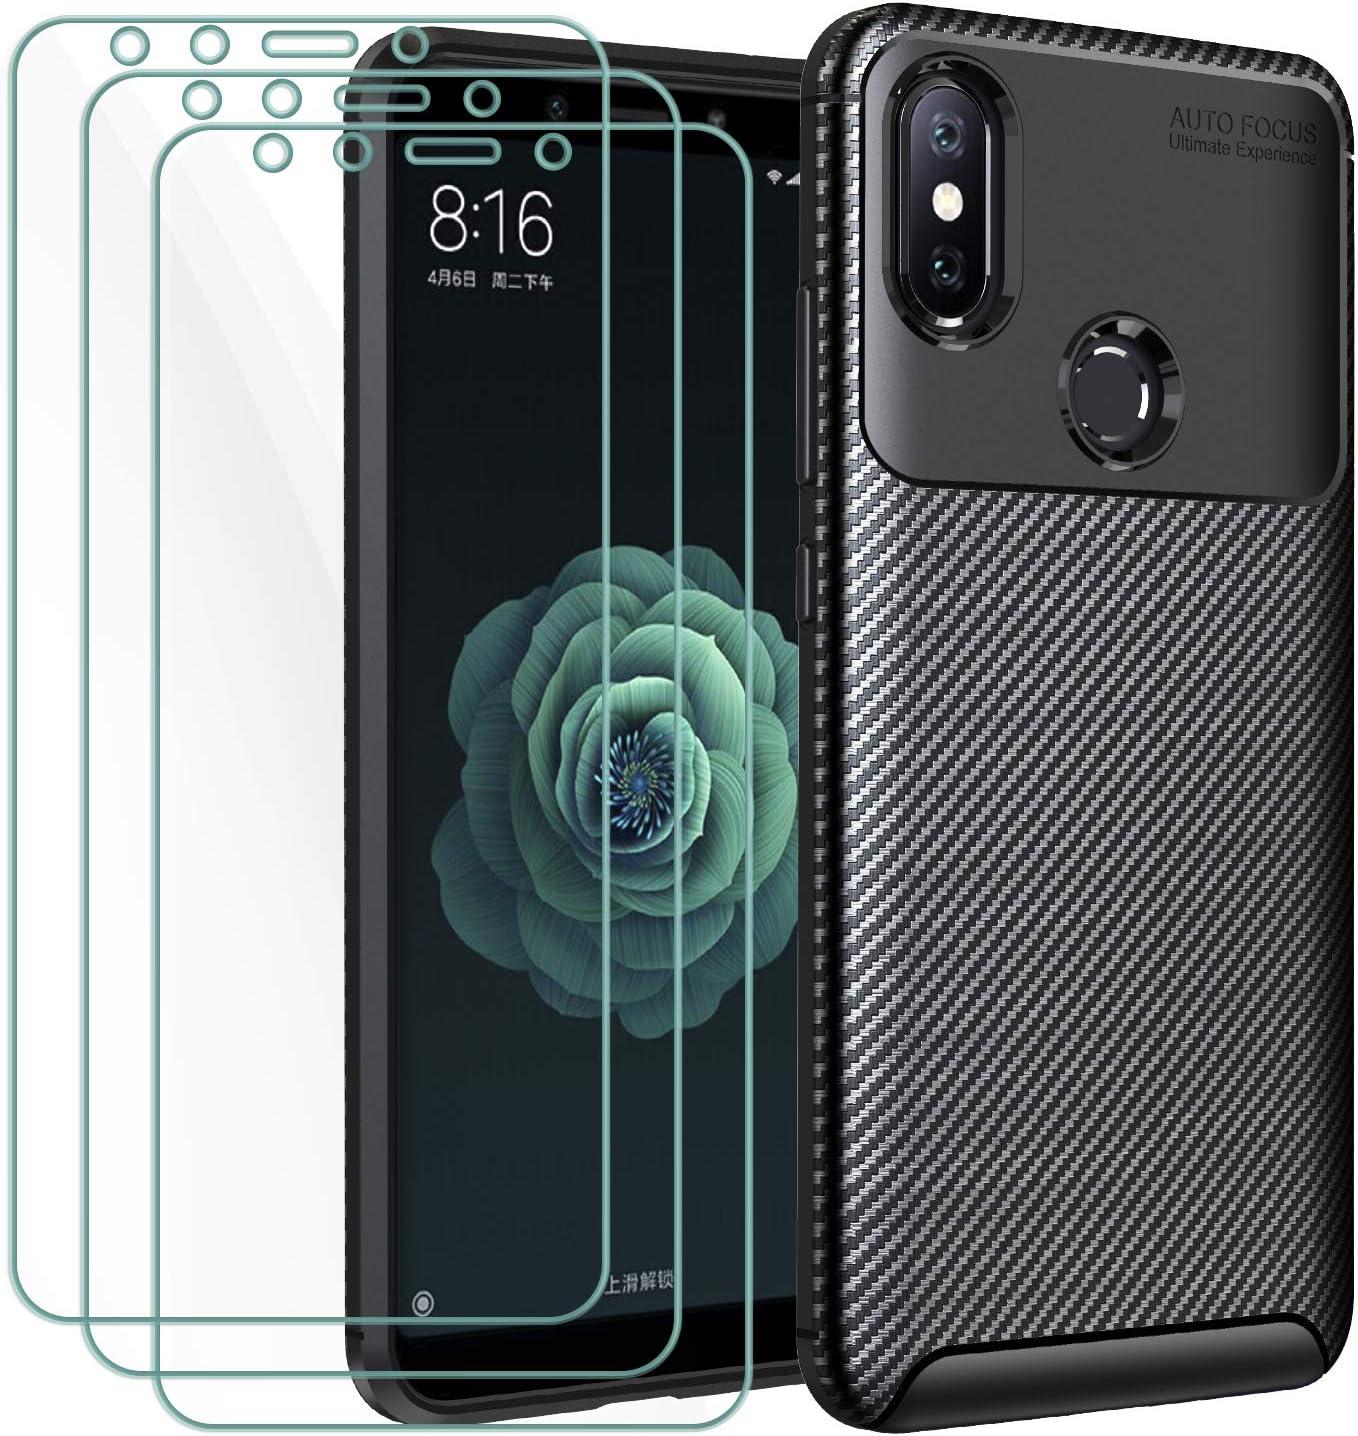 ivoler Funda para Xiaomi Mi A2 + 3 Unidades Cristal Templado, Fibra de Carbono Negro TPU Suave de Silicona [Carcasa + Vidrio Templado] Ultra Fina Caso y Protector de Pantalla